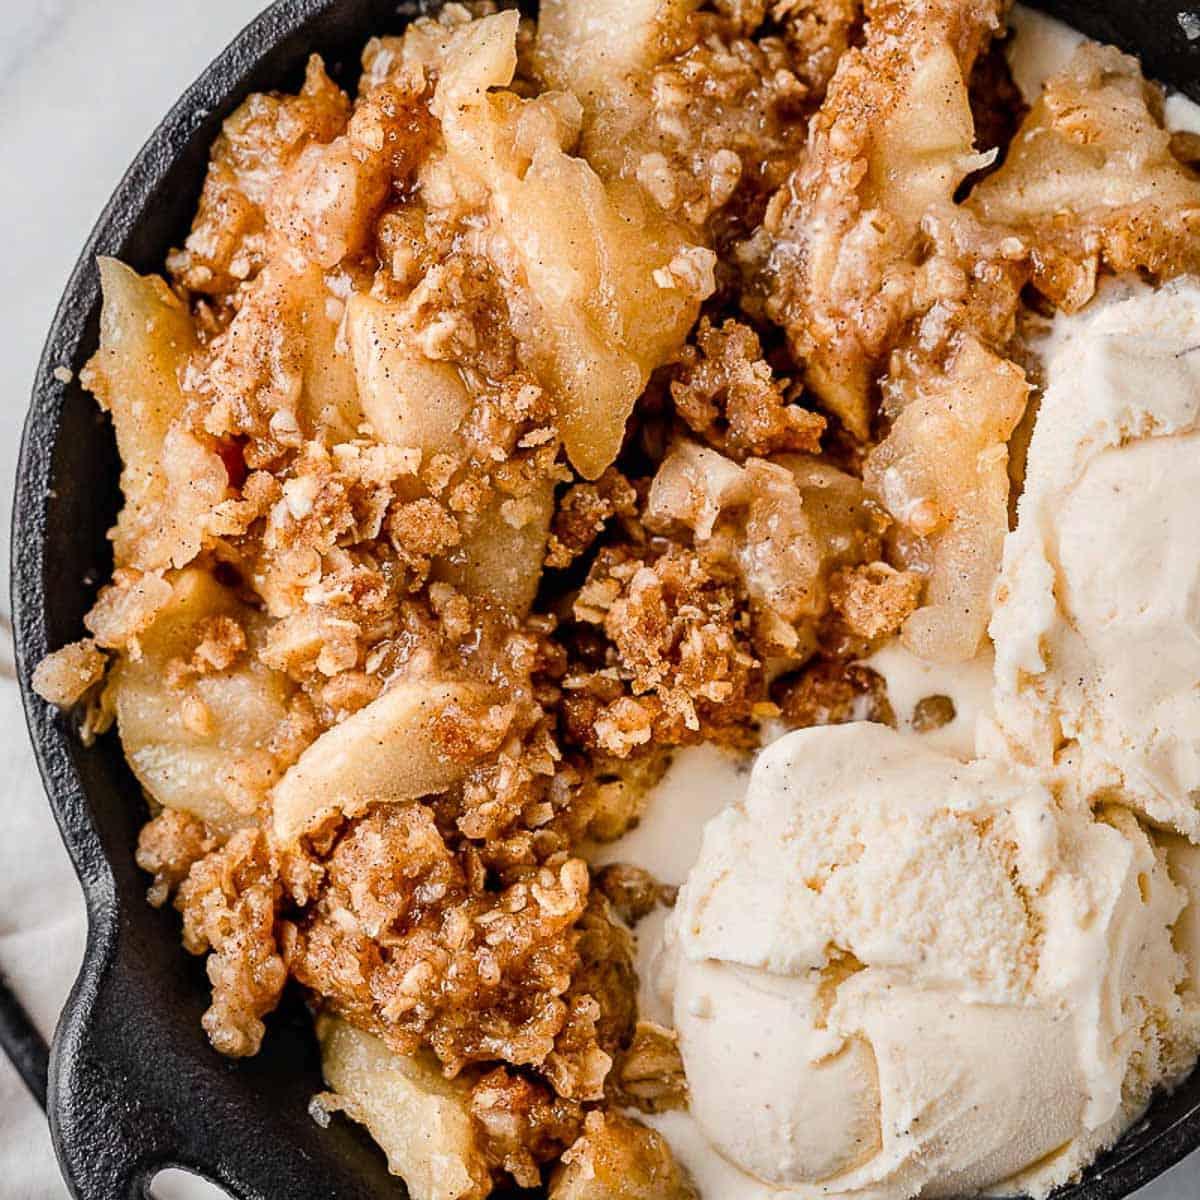 Apple crisp in a bowl with vanilla ice cream.